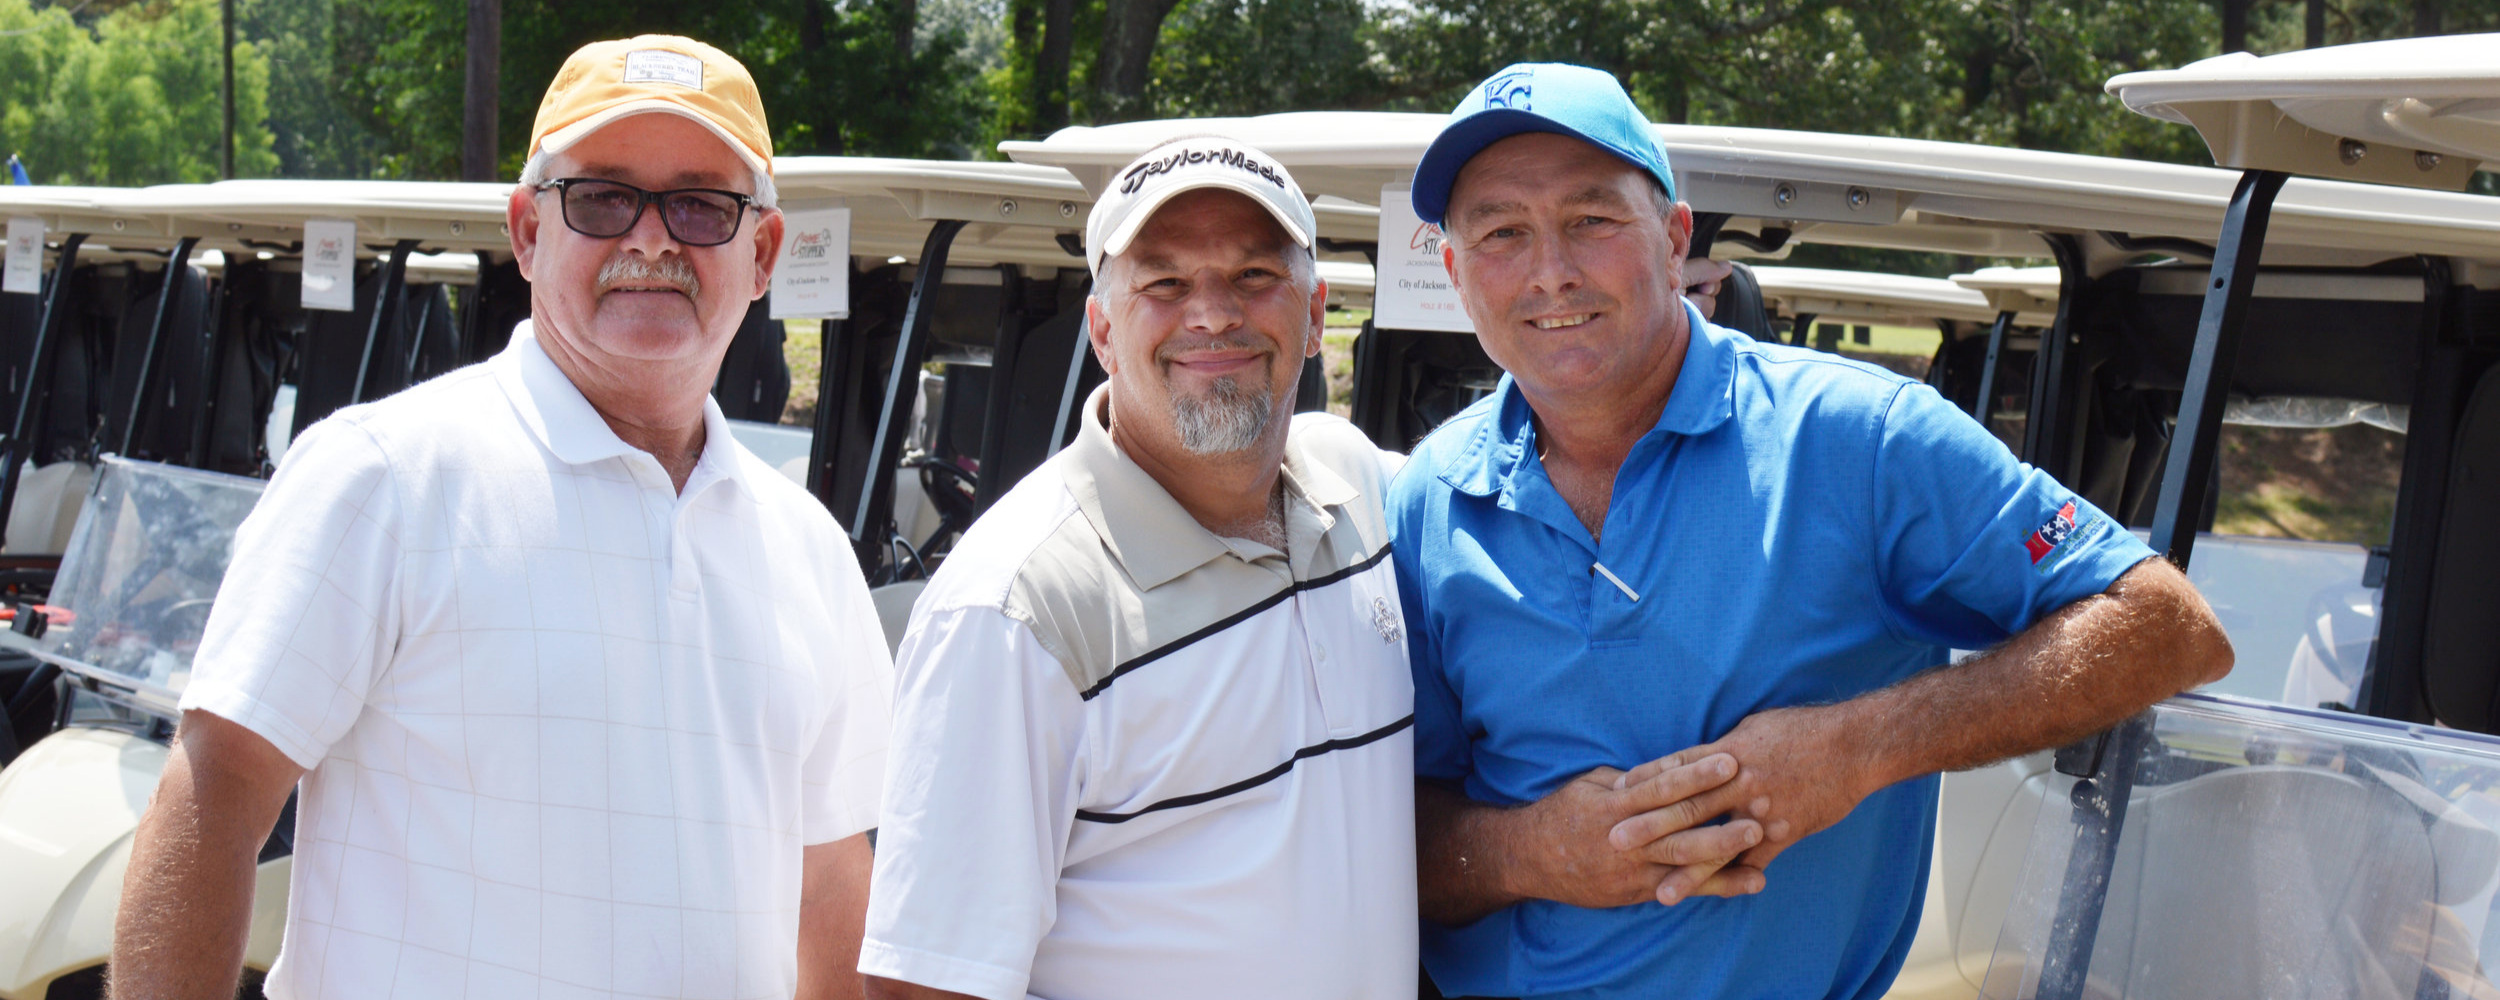 Randy Conner, David Miller & Jimmy Strickland